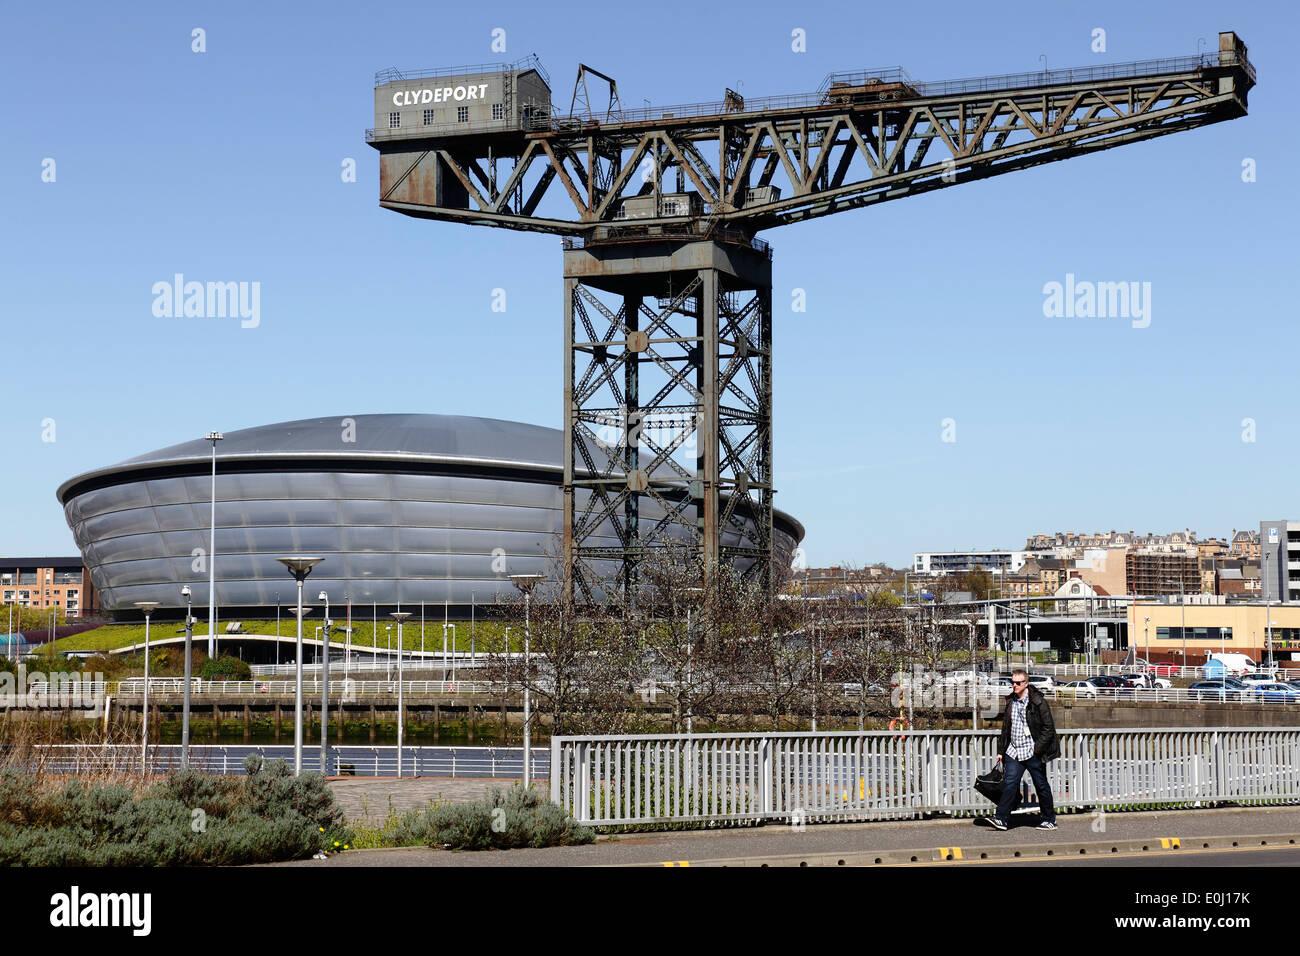 The Finnieston Crane and SSE Hydro building, Scotland, UK - Stock Image